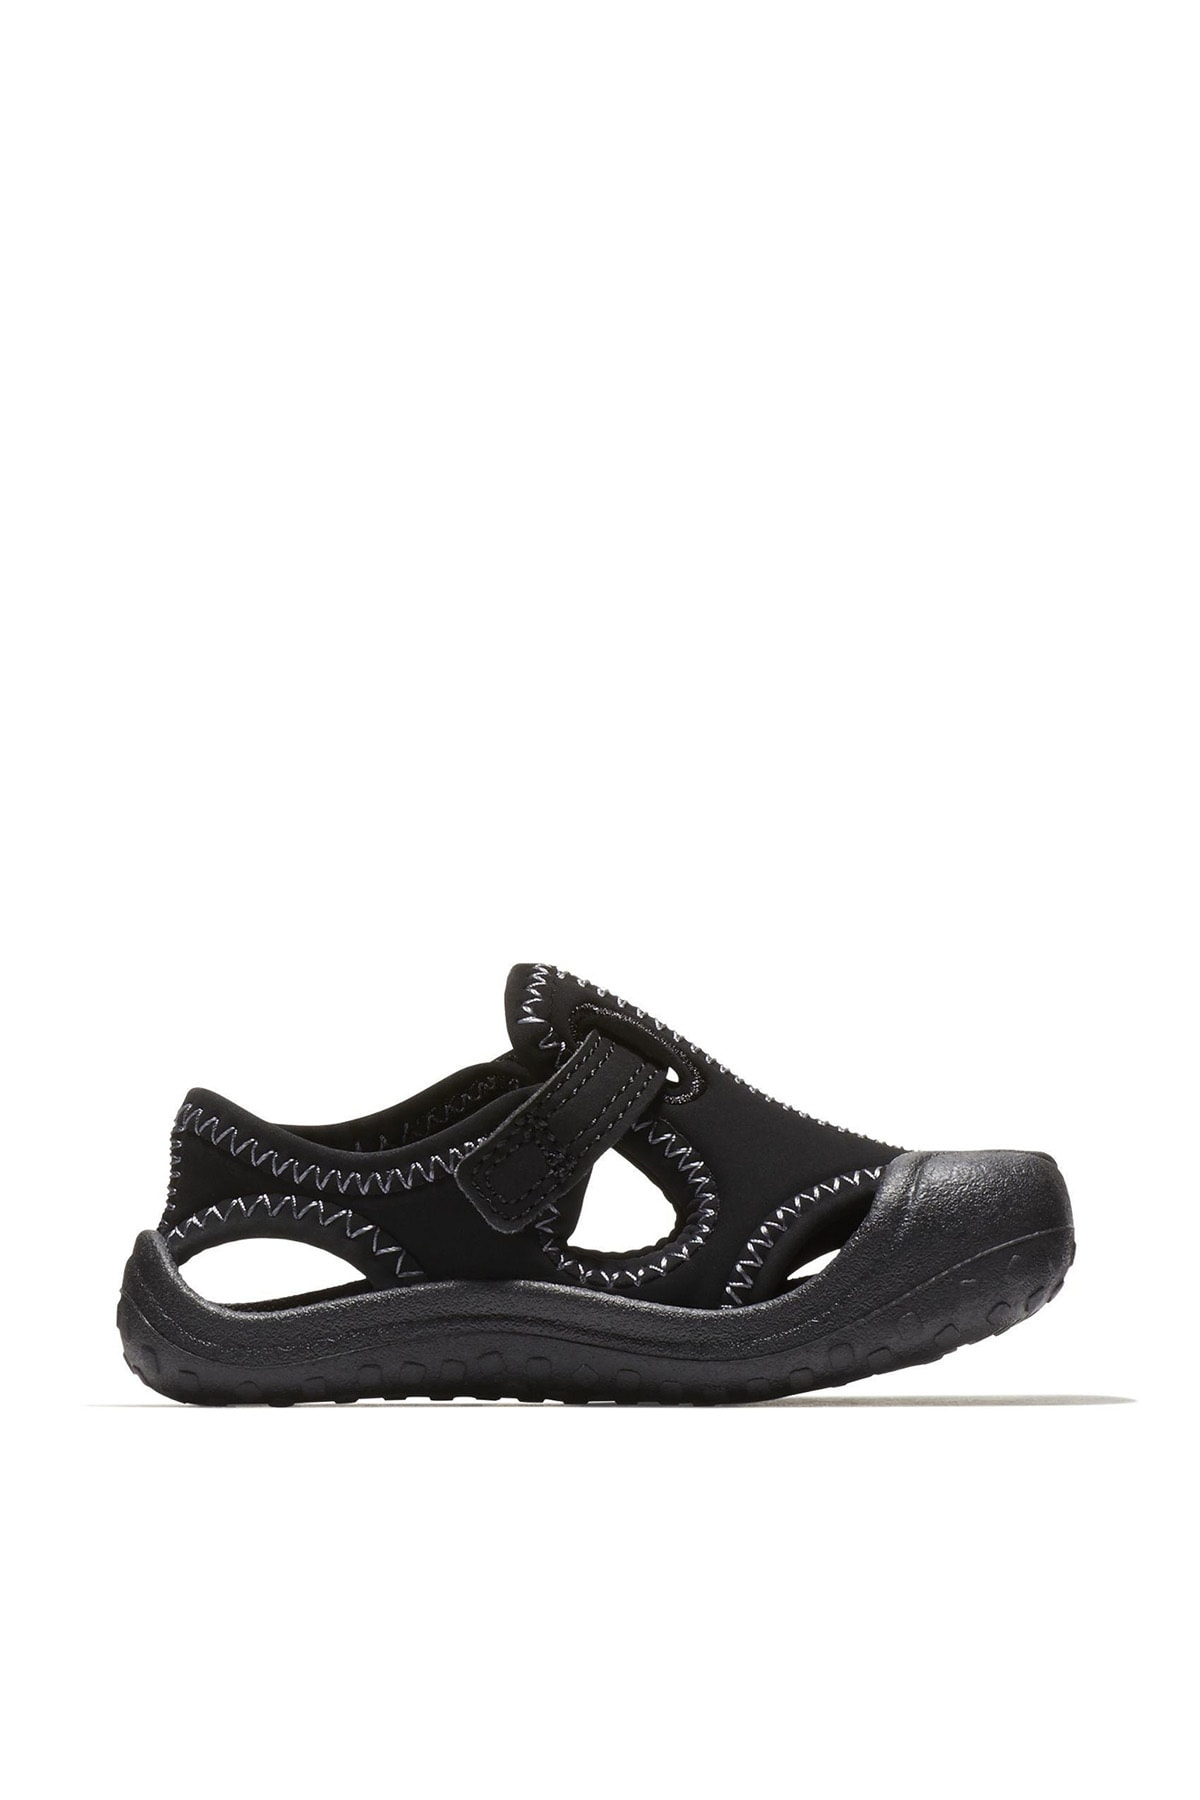 Nike Kids Siyah 903632-001 Sunray Protect Bebek Sandalet